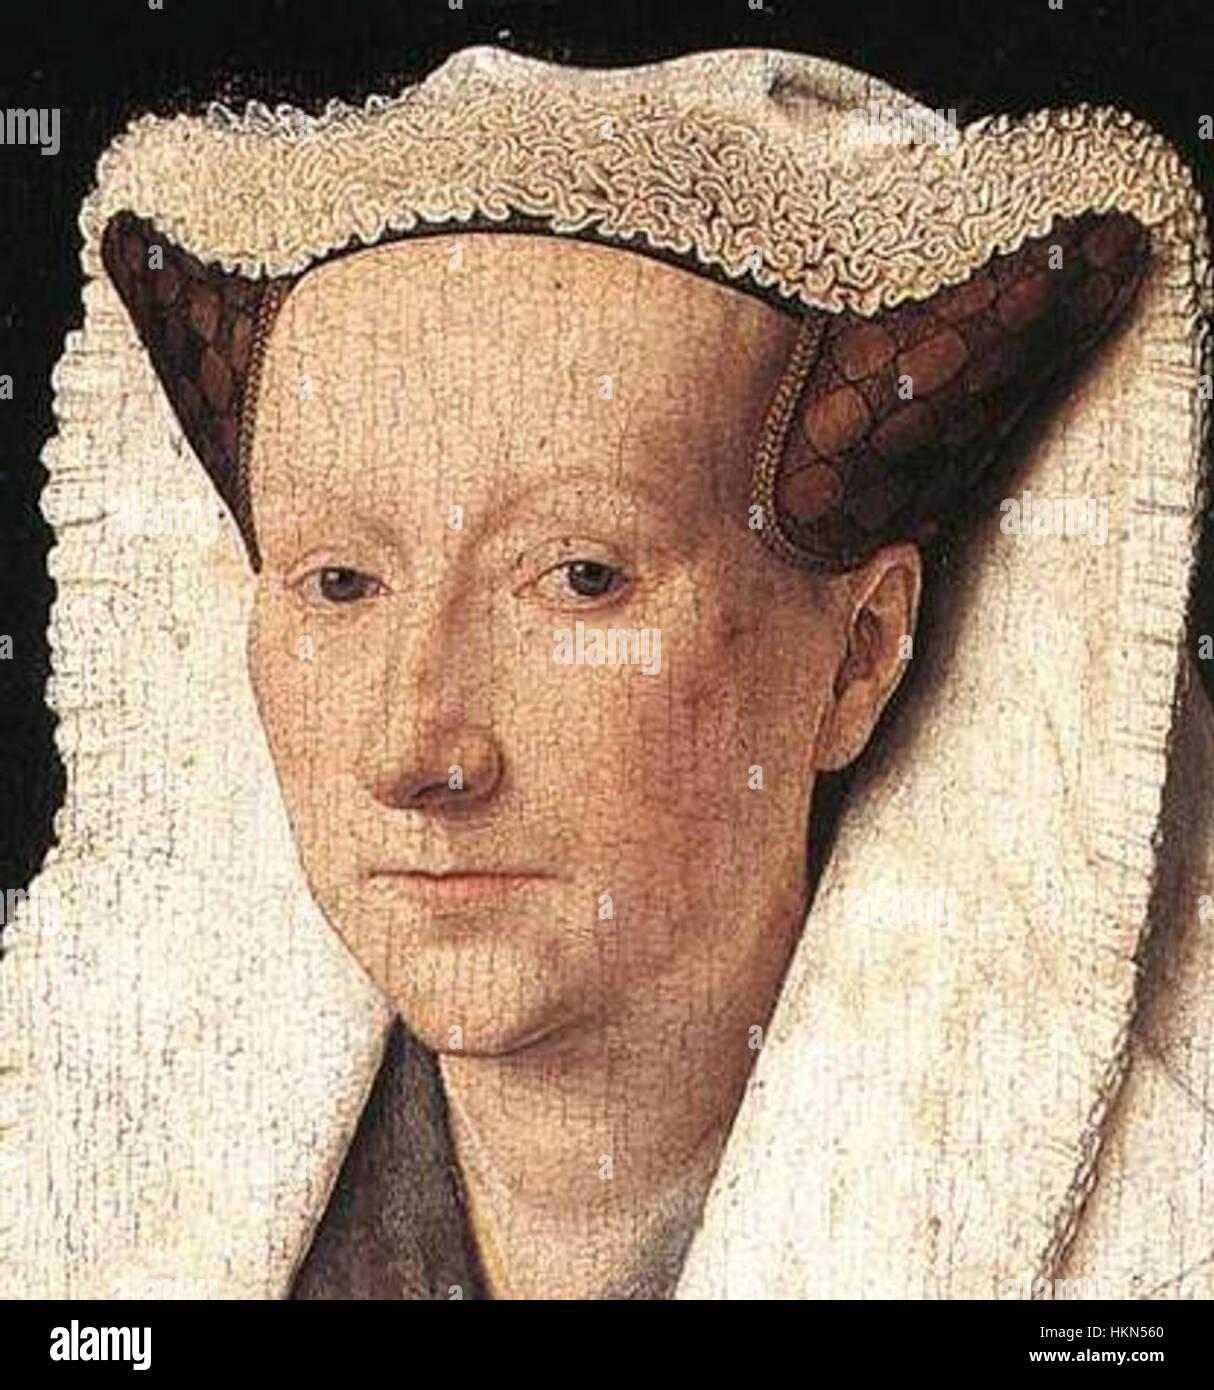 Jan van Eyck - Portrait of Margareta van Eyck - WGA7618 (cropped) Stock Photo